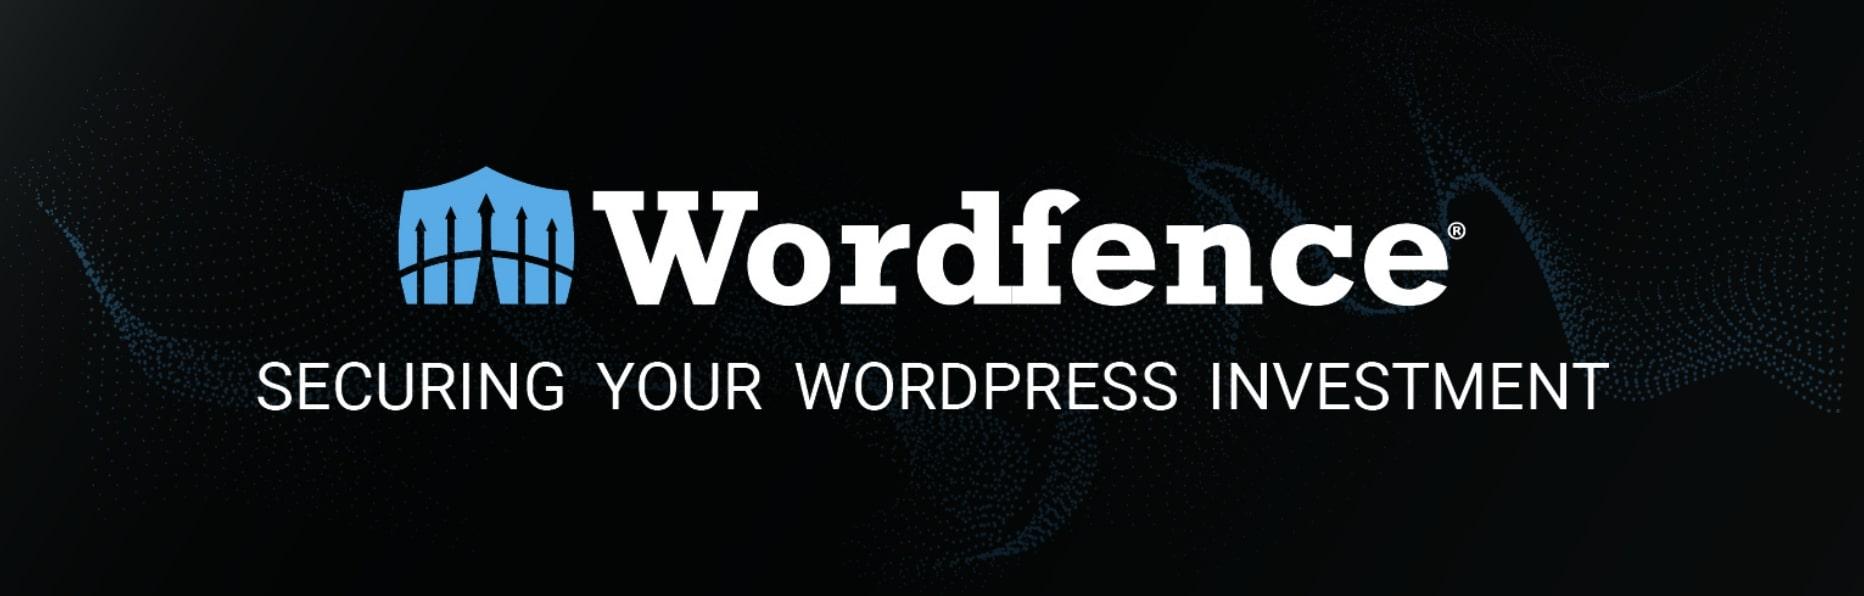 Daftar 15 Plugin Wordpress Wajib Ada di Blog untuk SEO (Edisi 2019) 11